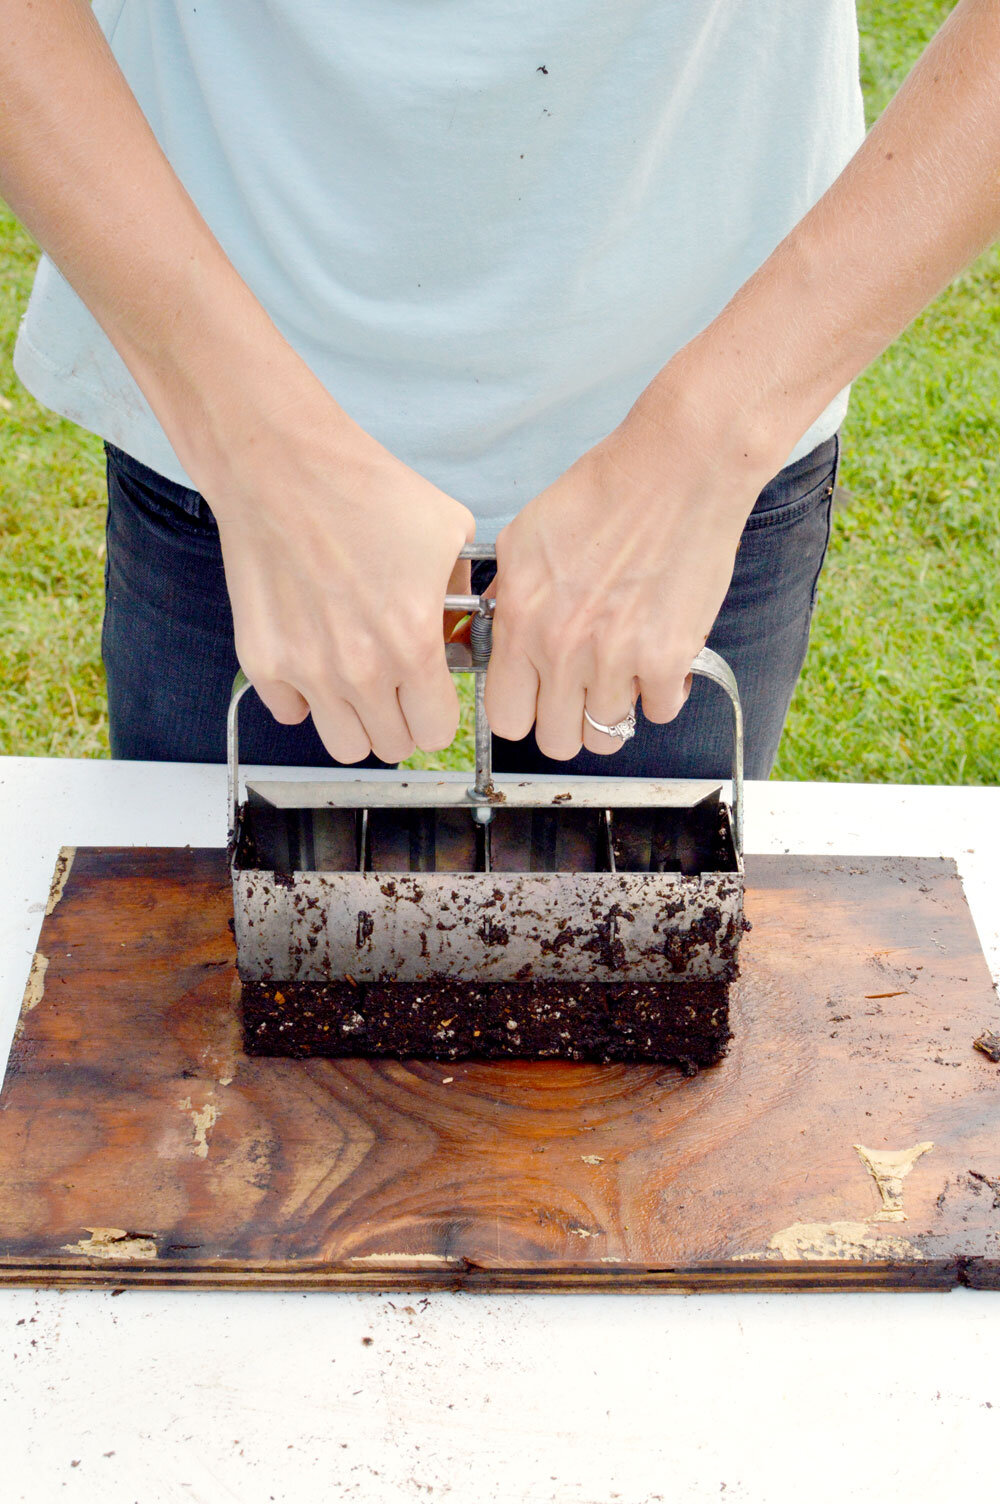 Soil-Block-Making-2.jpg